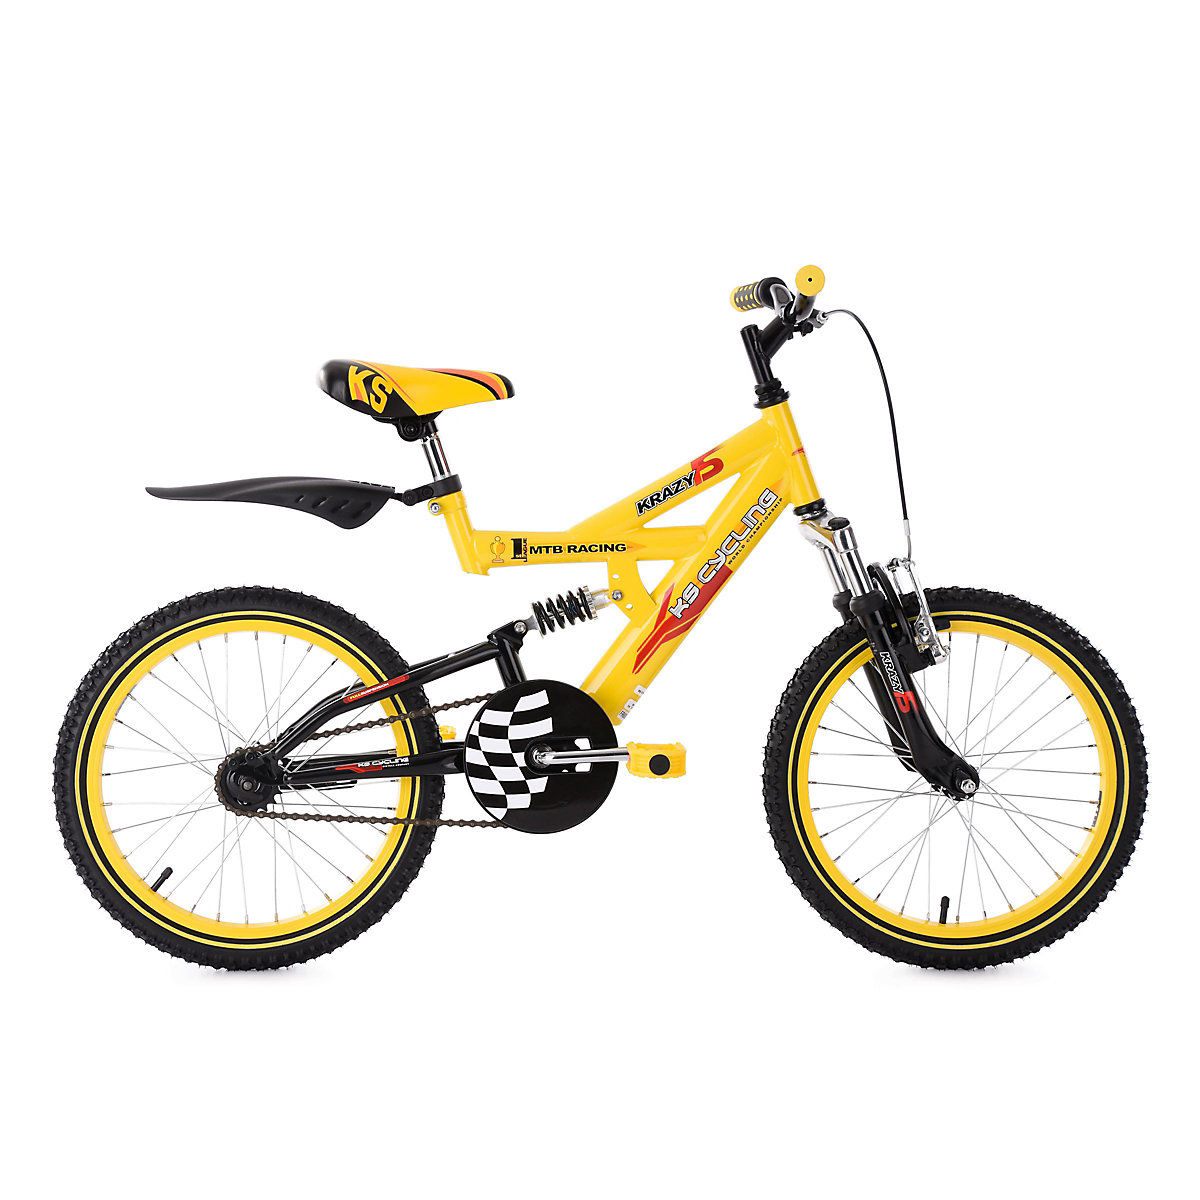 mountainbike krazy 18 zoll gelb ks cycling mytoys. Black Bedroom Furniture Sets. Home Design Ideas